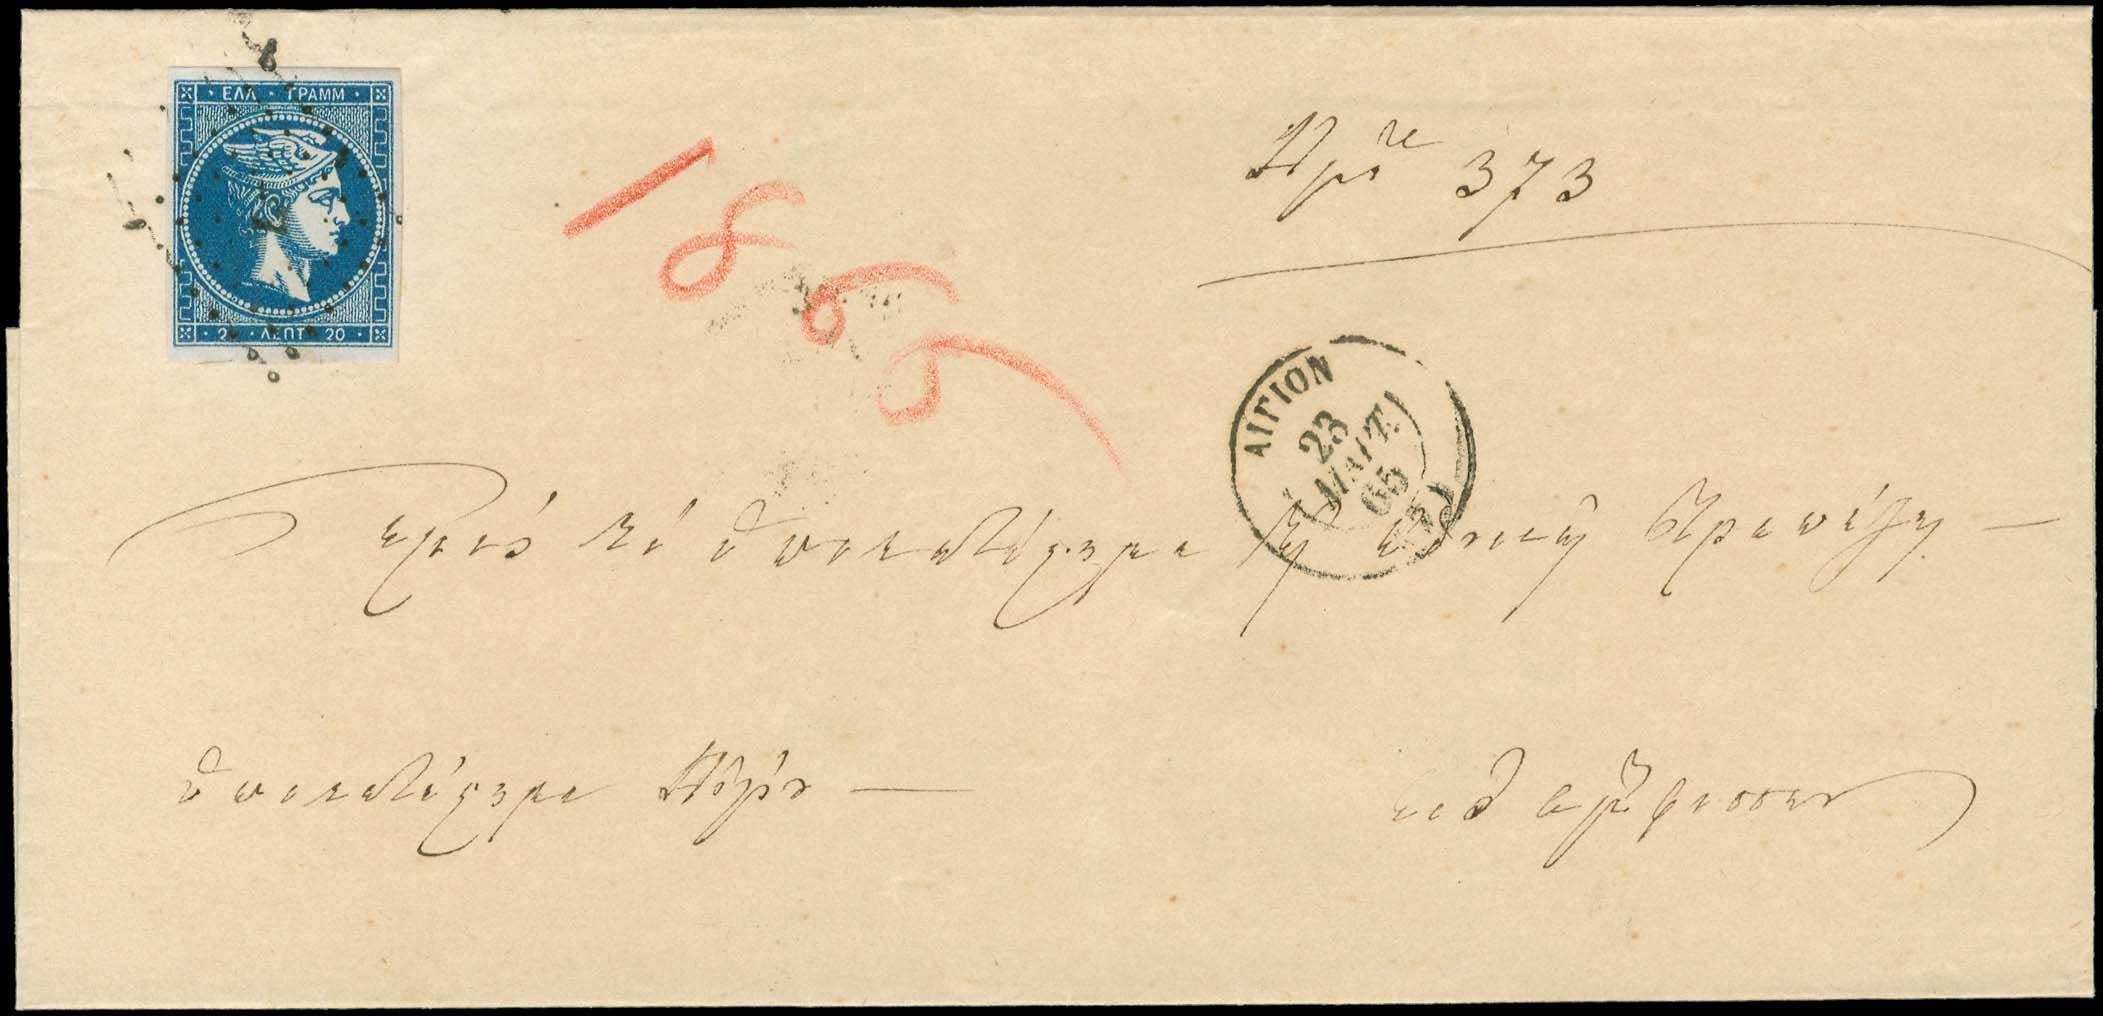 Lot 93 - large hermes head 1862/67 consecutive athens printings -  A. Karamitsos Postal & Live Internet Auction 680 General Philatelic Auction